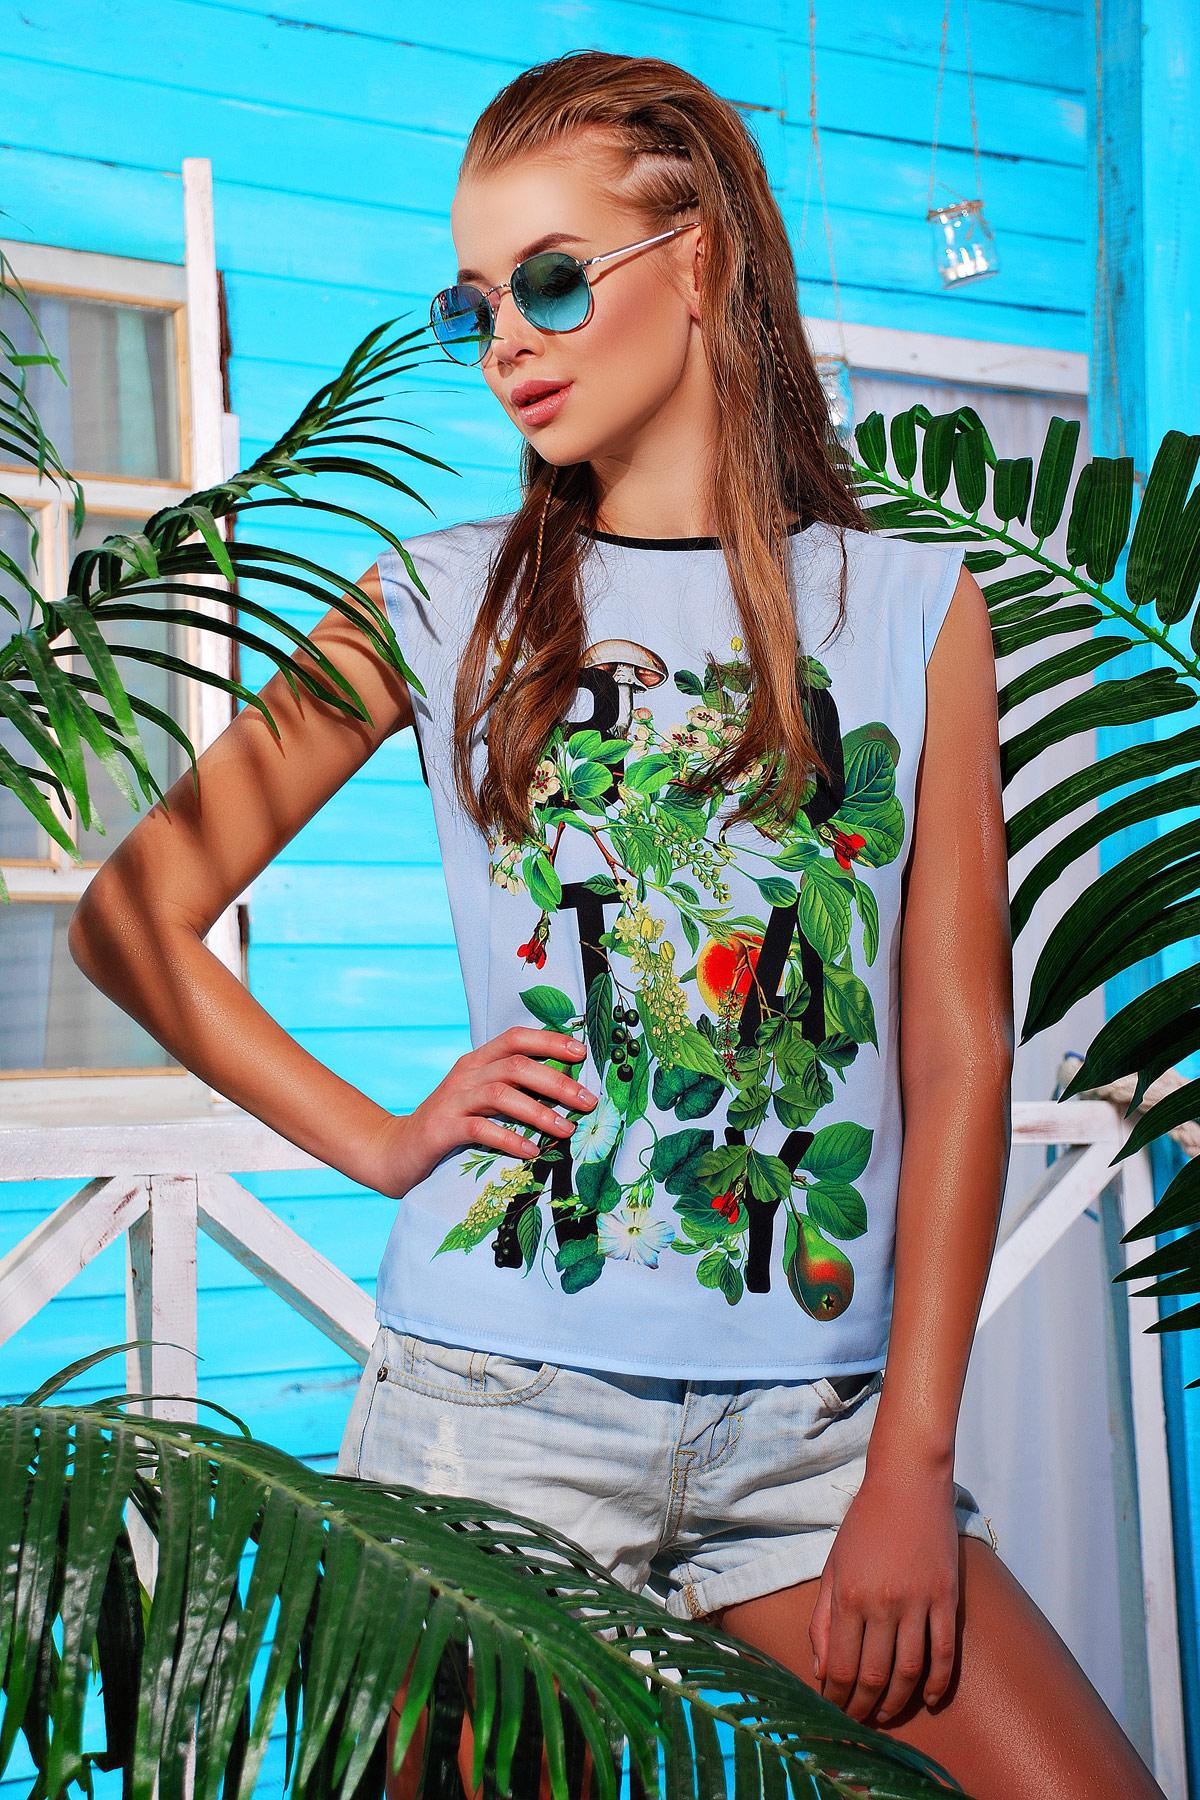 Botanly футболка Киви-Б. Цвет: принт